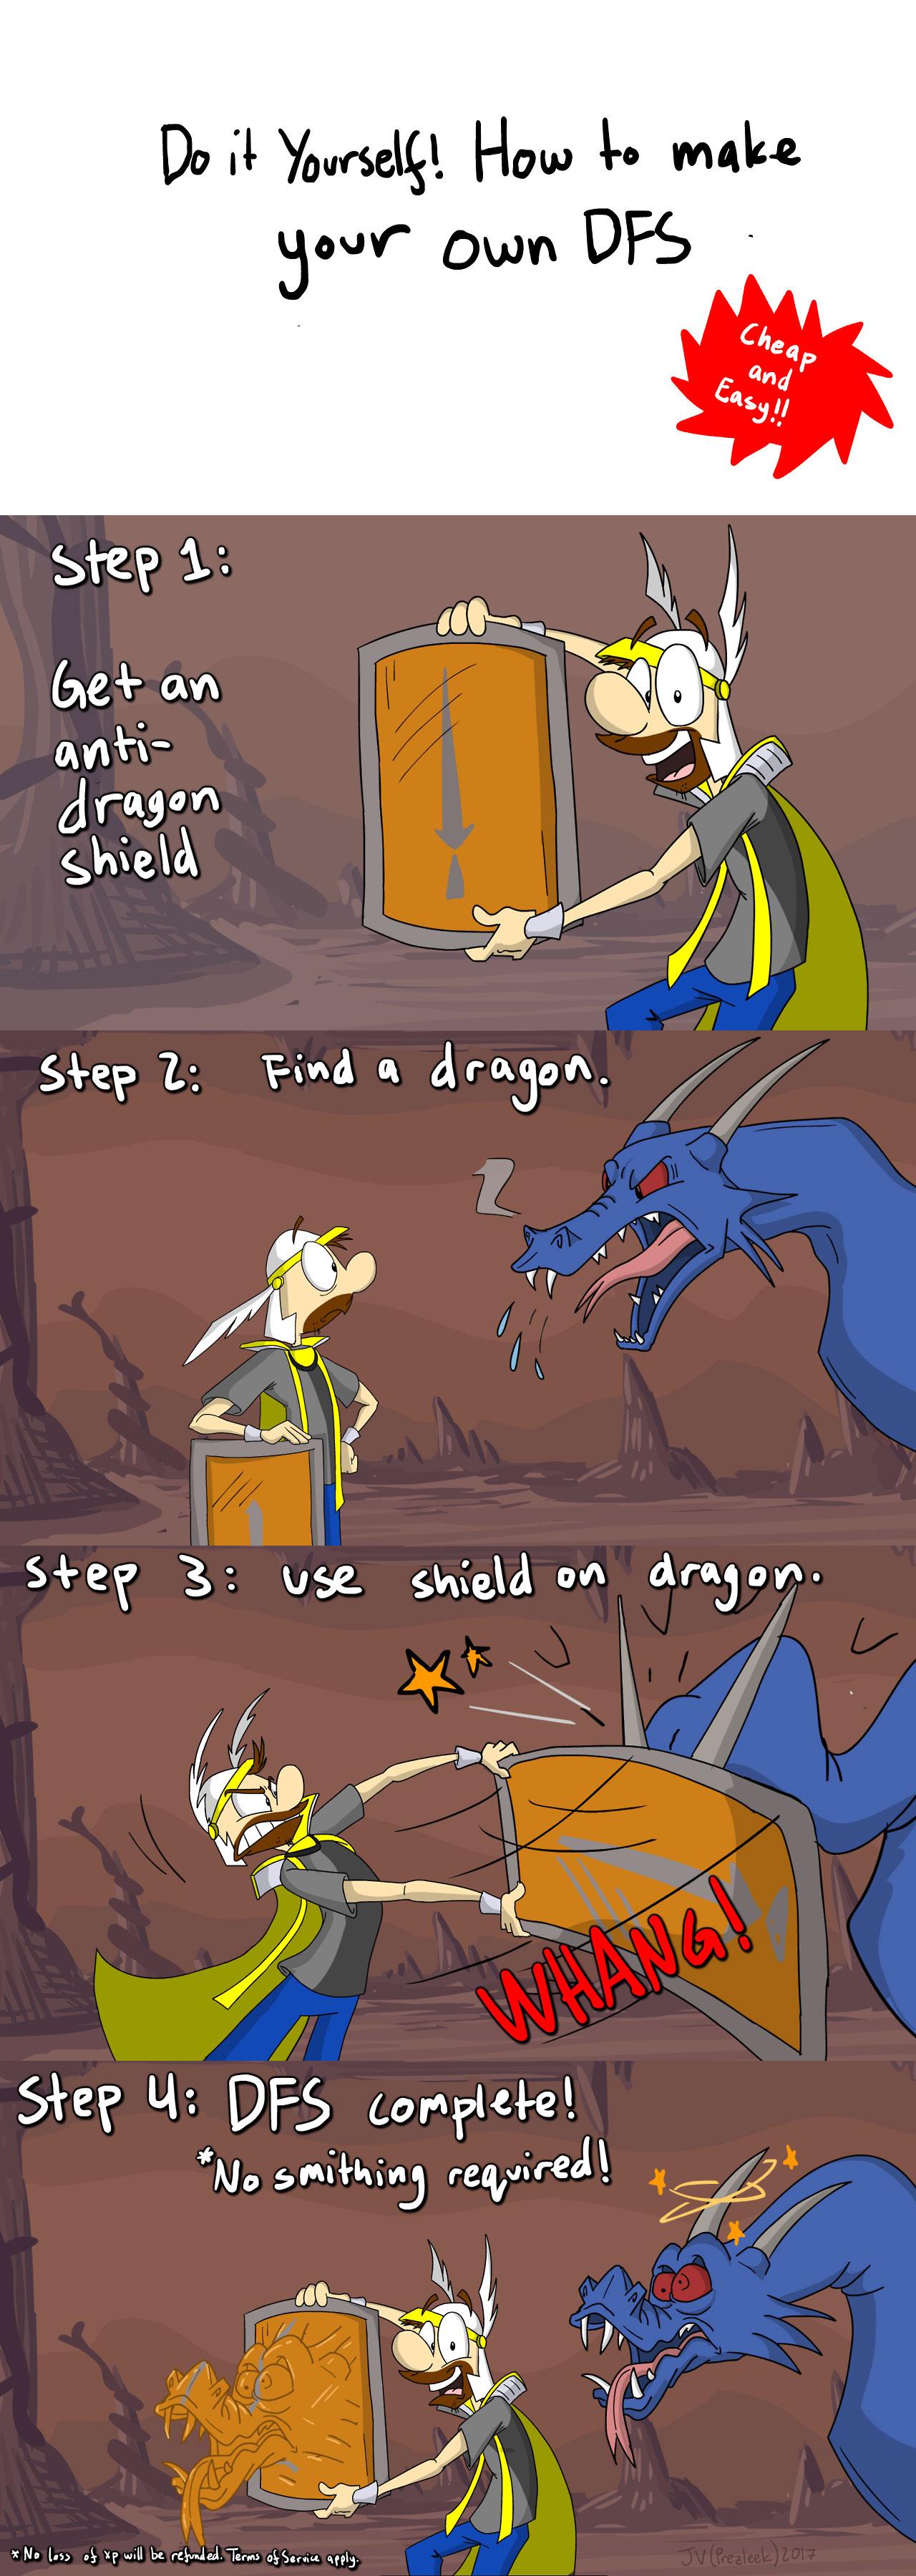 Do it yourself dragonfire shield a video games comic dueling analogs do it yourself dragonfire shield solutioingenieria Choice Image